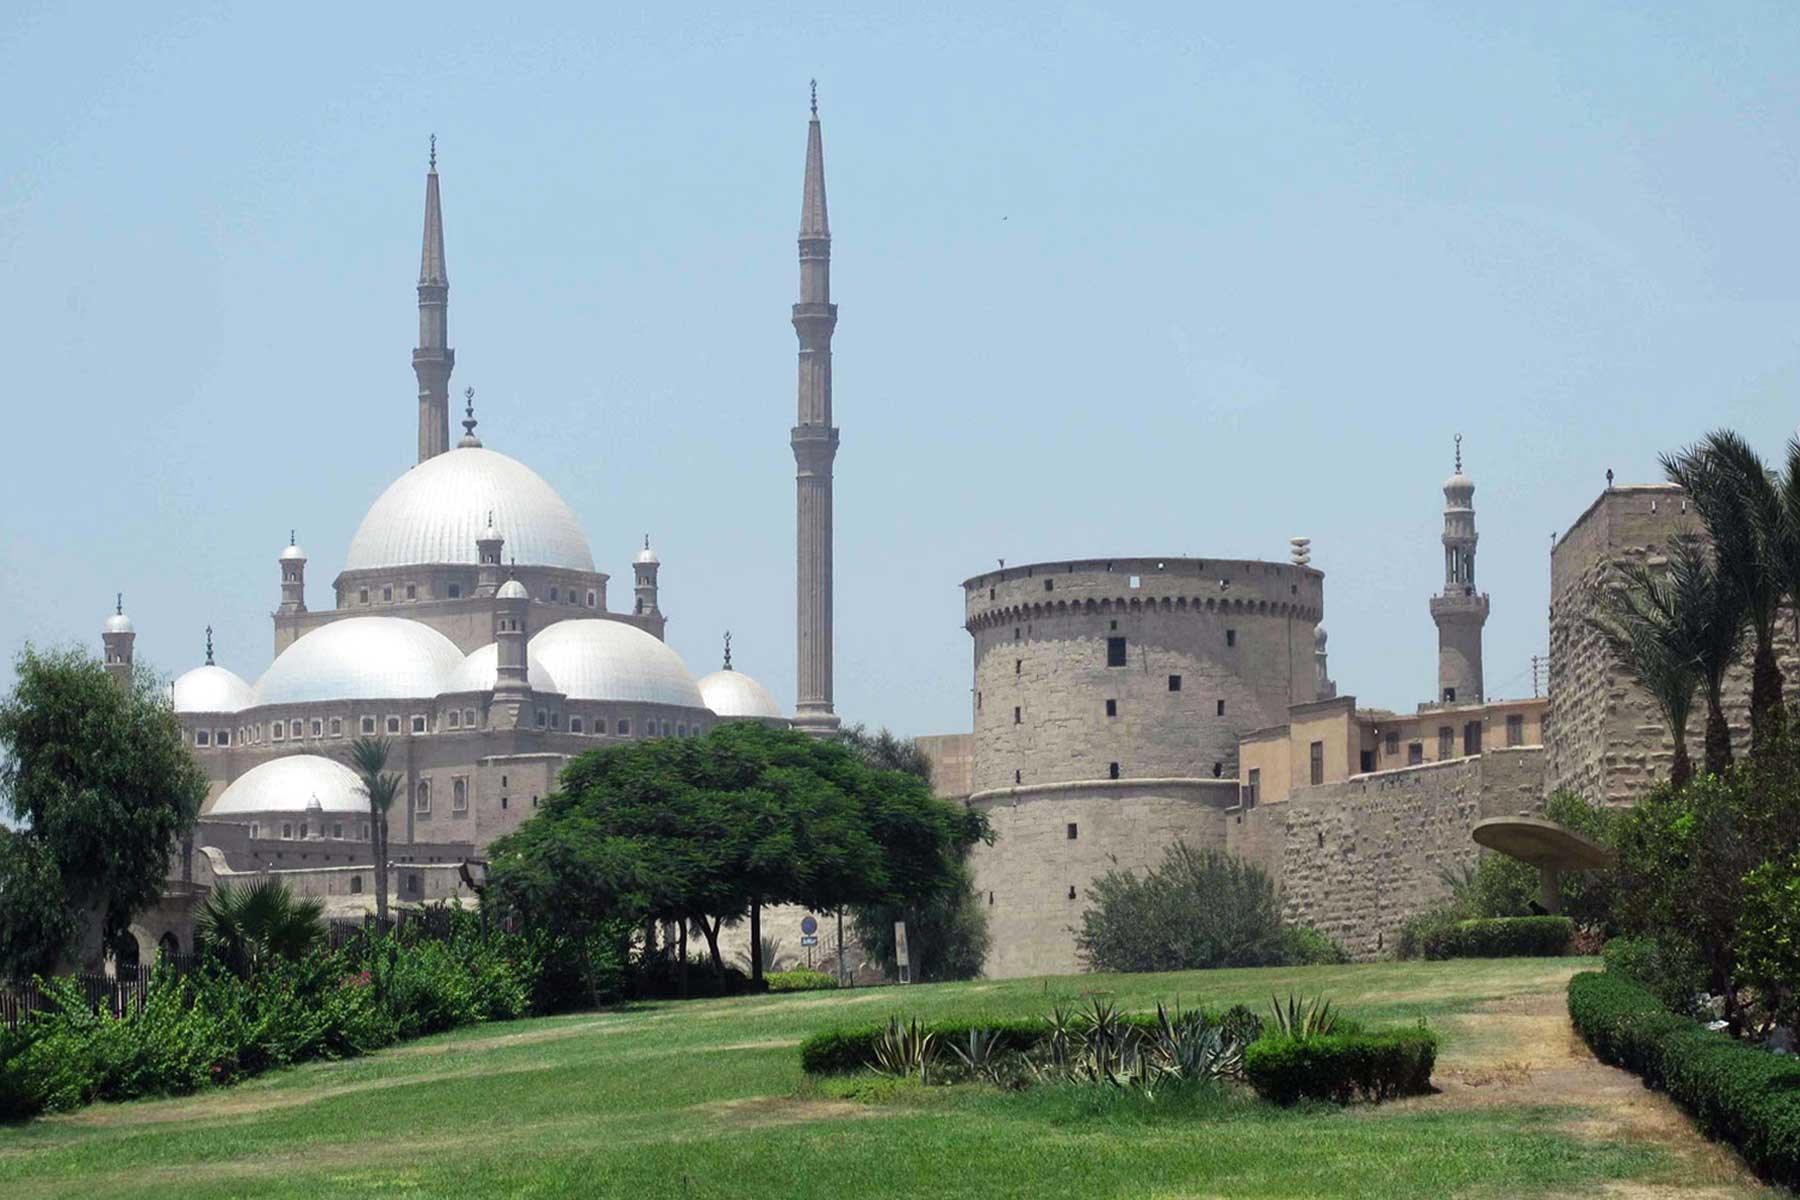 The citadel Cairo